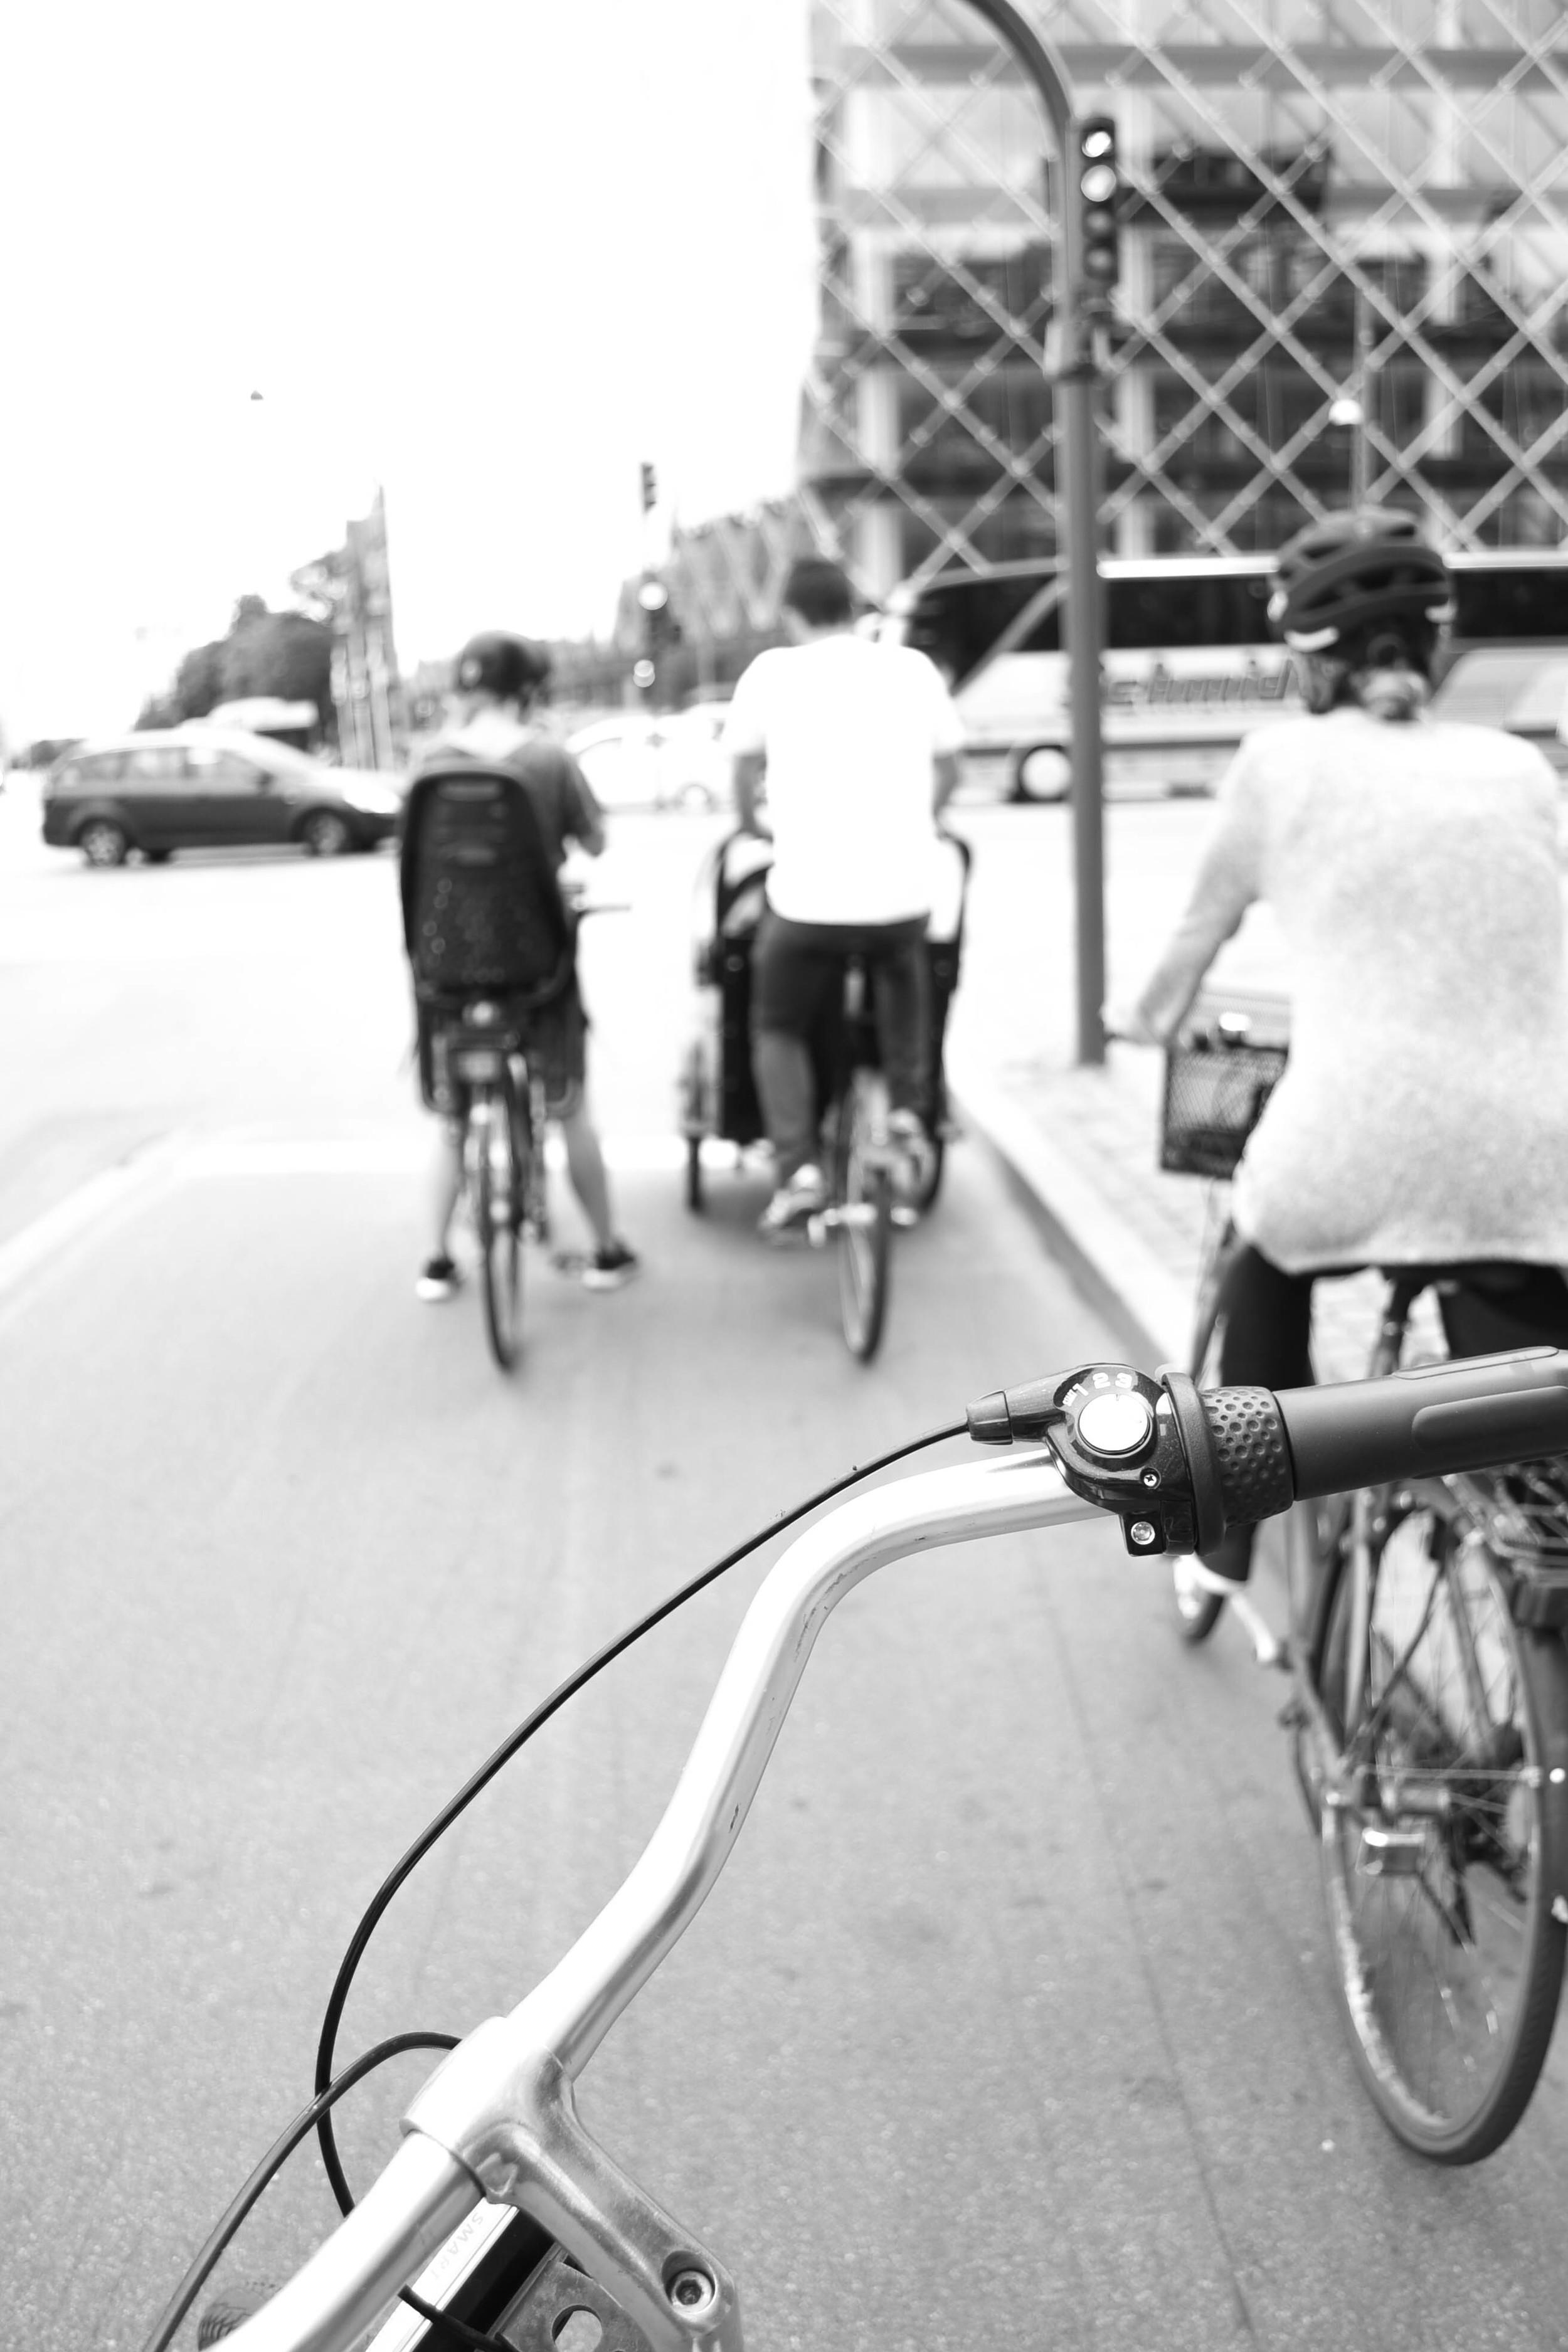 Traffic congestion. Copenhagen-style.